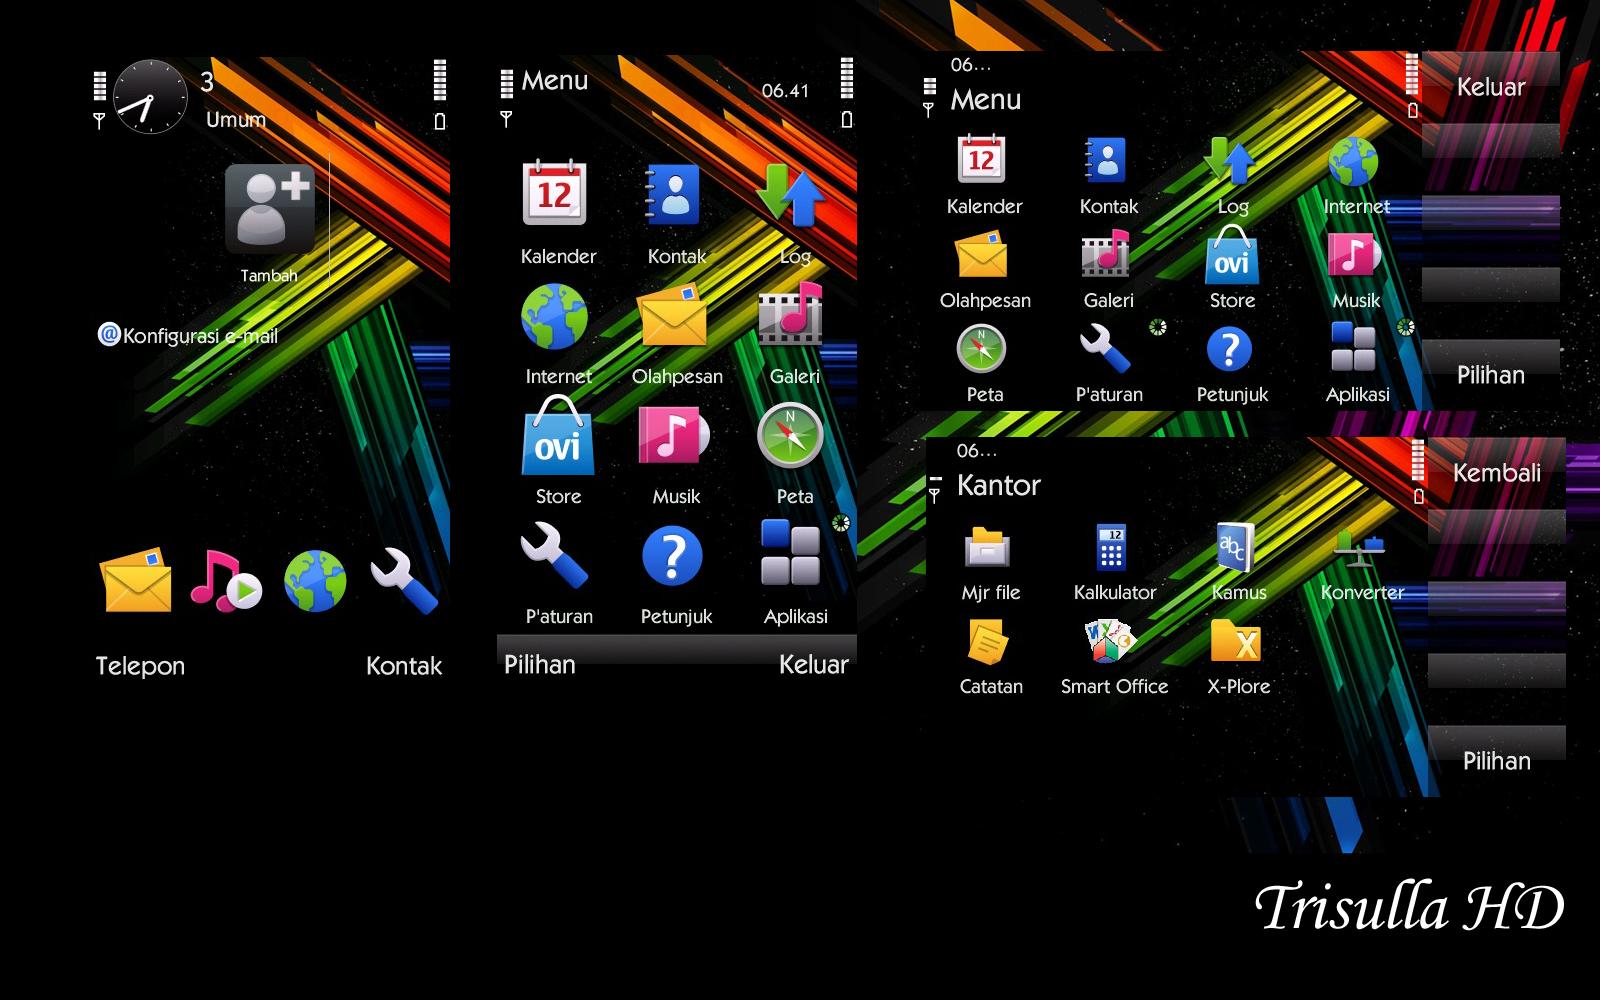 http://3.bp.blogspot.com/-AYzussgUW5I/Tfw8OBeg_VI/AAAAAAAAAoI/2FF3DpaIt6g/s1600/Nokia+5800+and+N97+Theme+%25232429+-+Trisulla+Def+Icon+by+yans.jpg